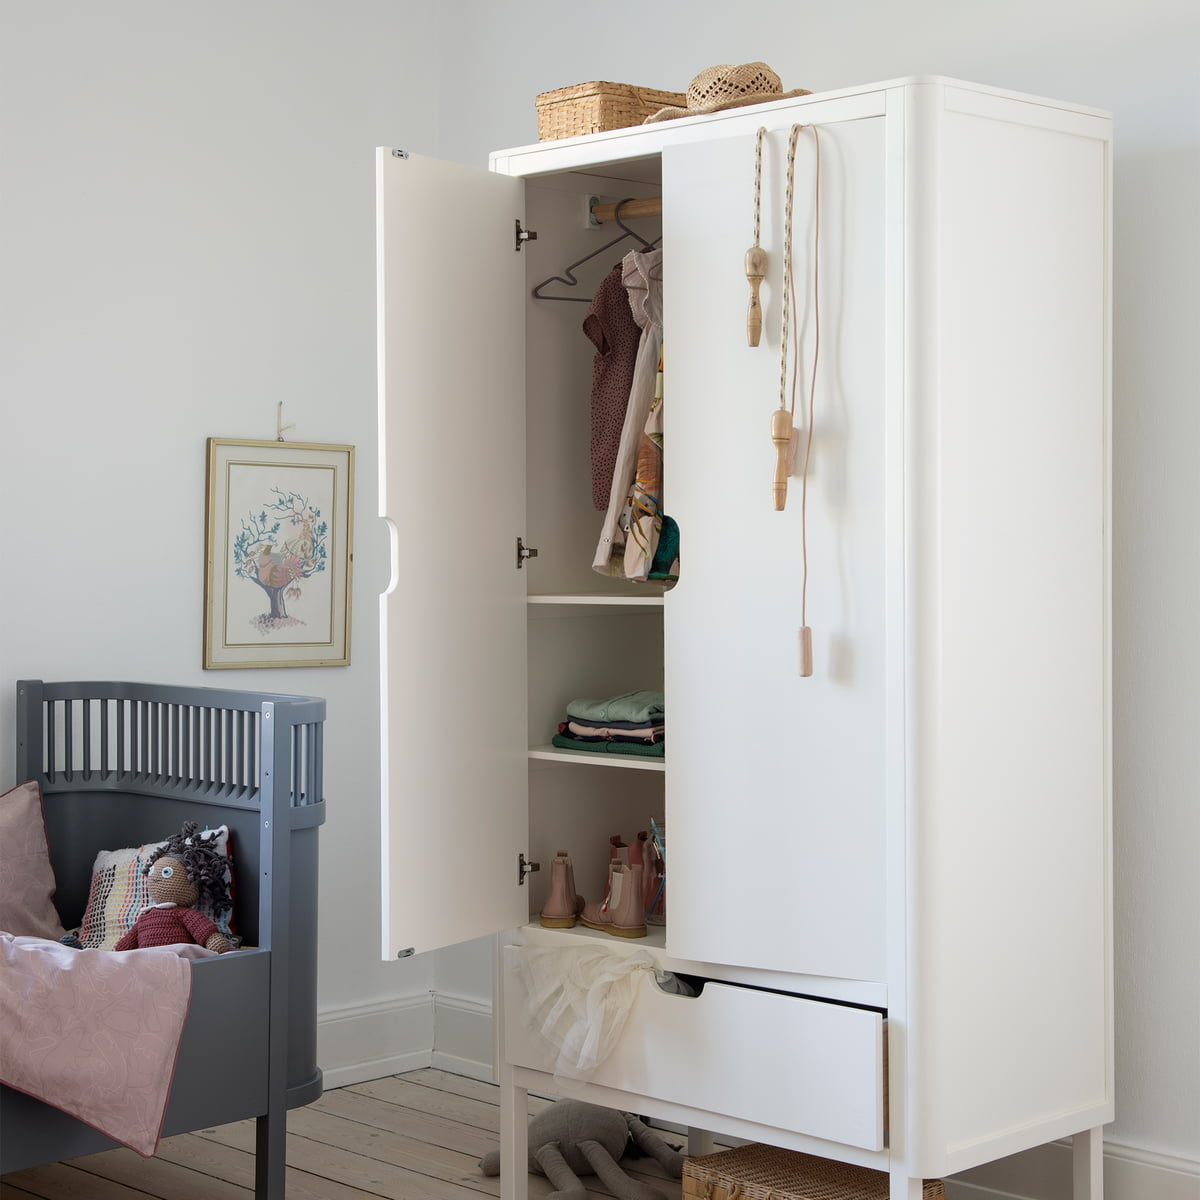 Sebra - Kinder Kleiderschrank, 1-türig, weiß